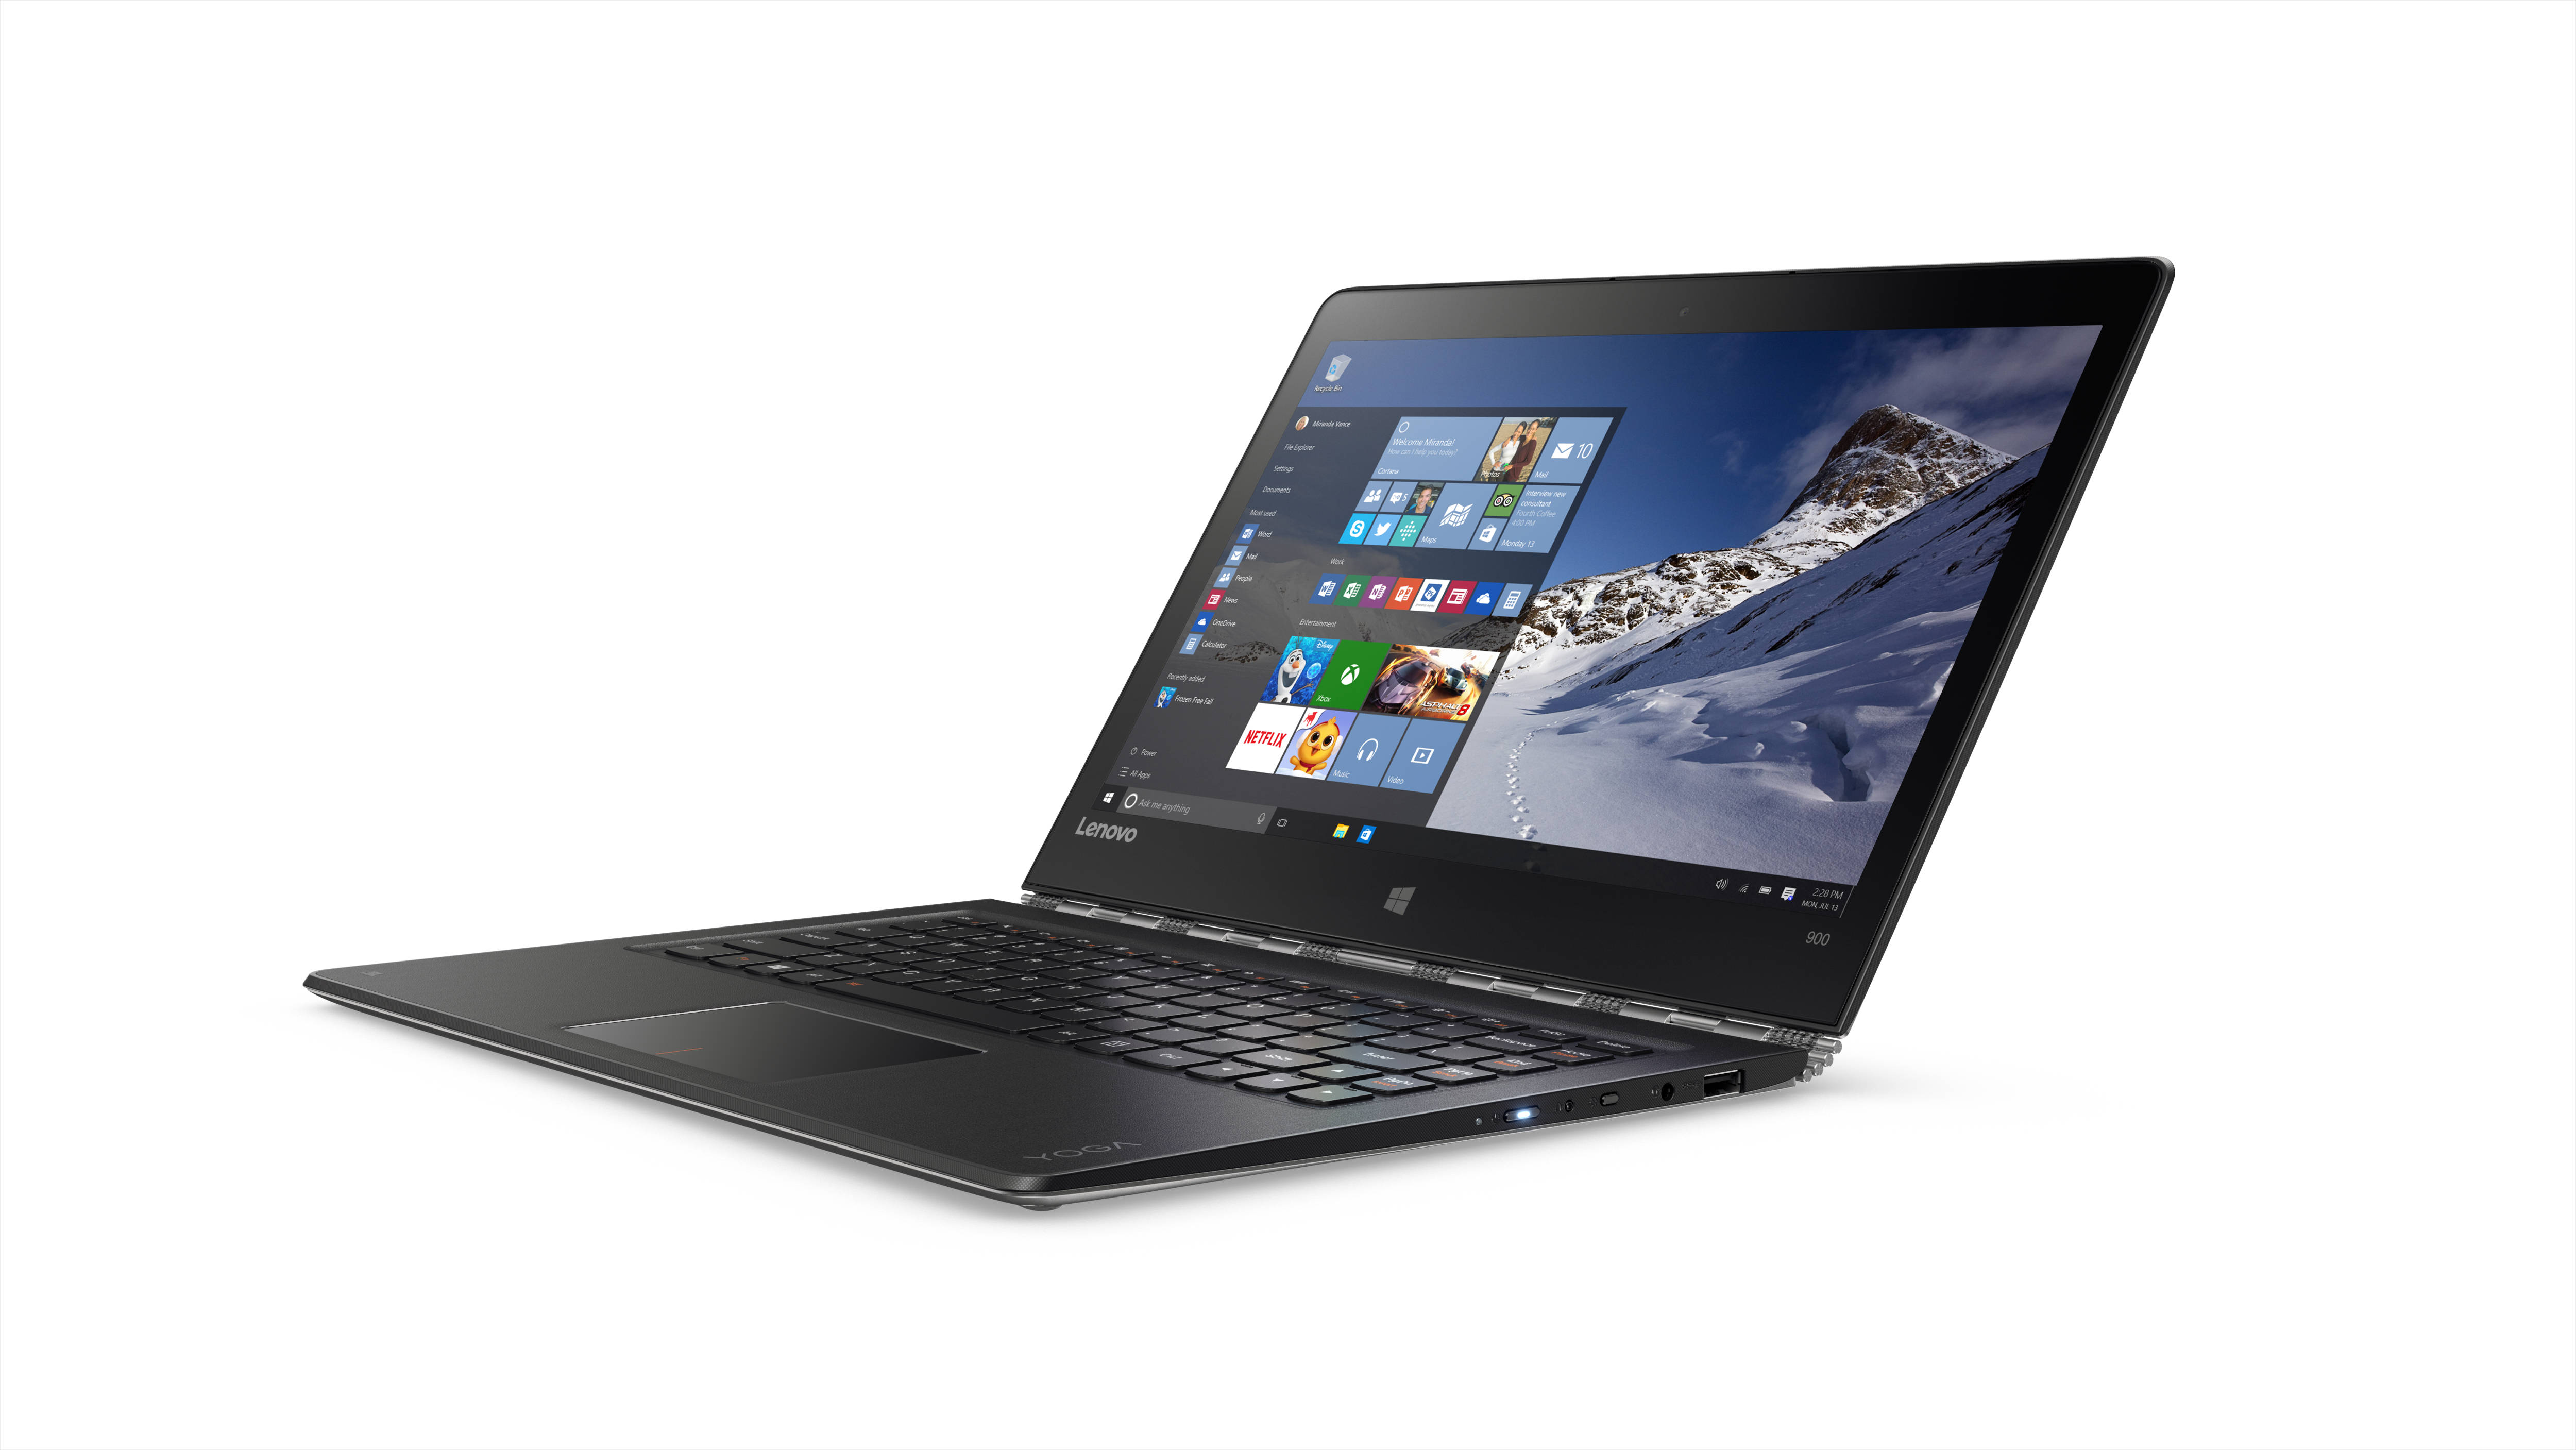 "Lenovo Yoga 900 13.3""QHD/I5-6260U/8G/256SSD/INT/W10"